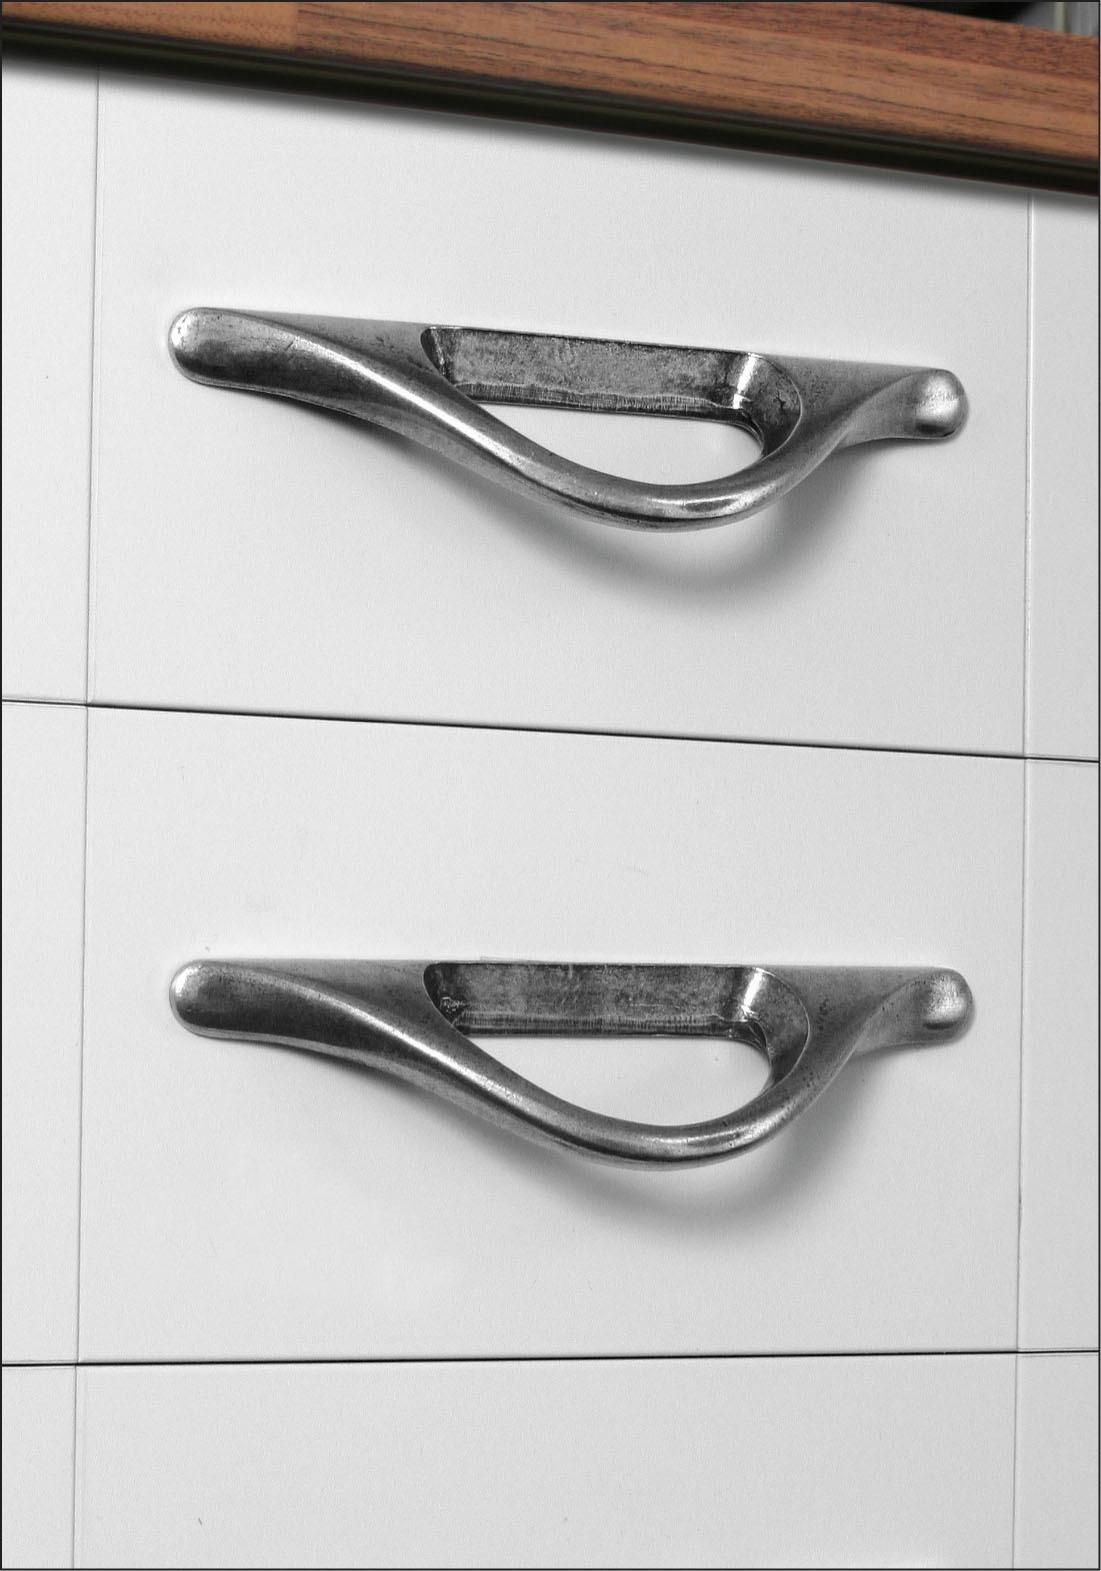 Sculptural Manzoni drawer pulls from Ashley Norton.